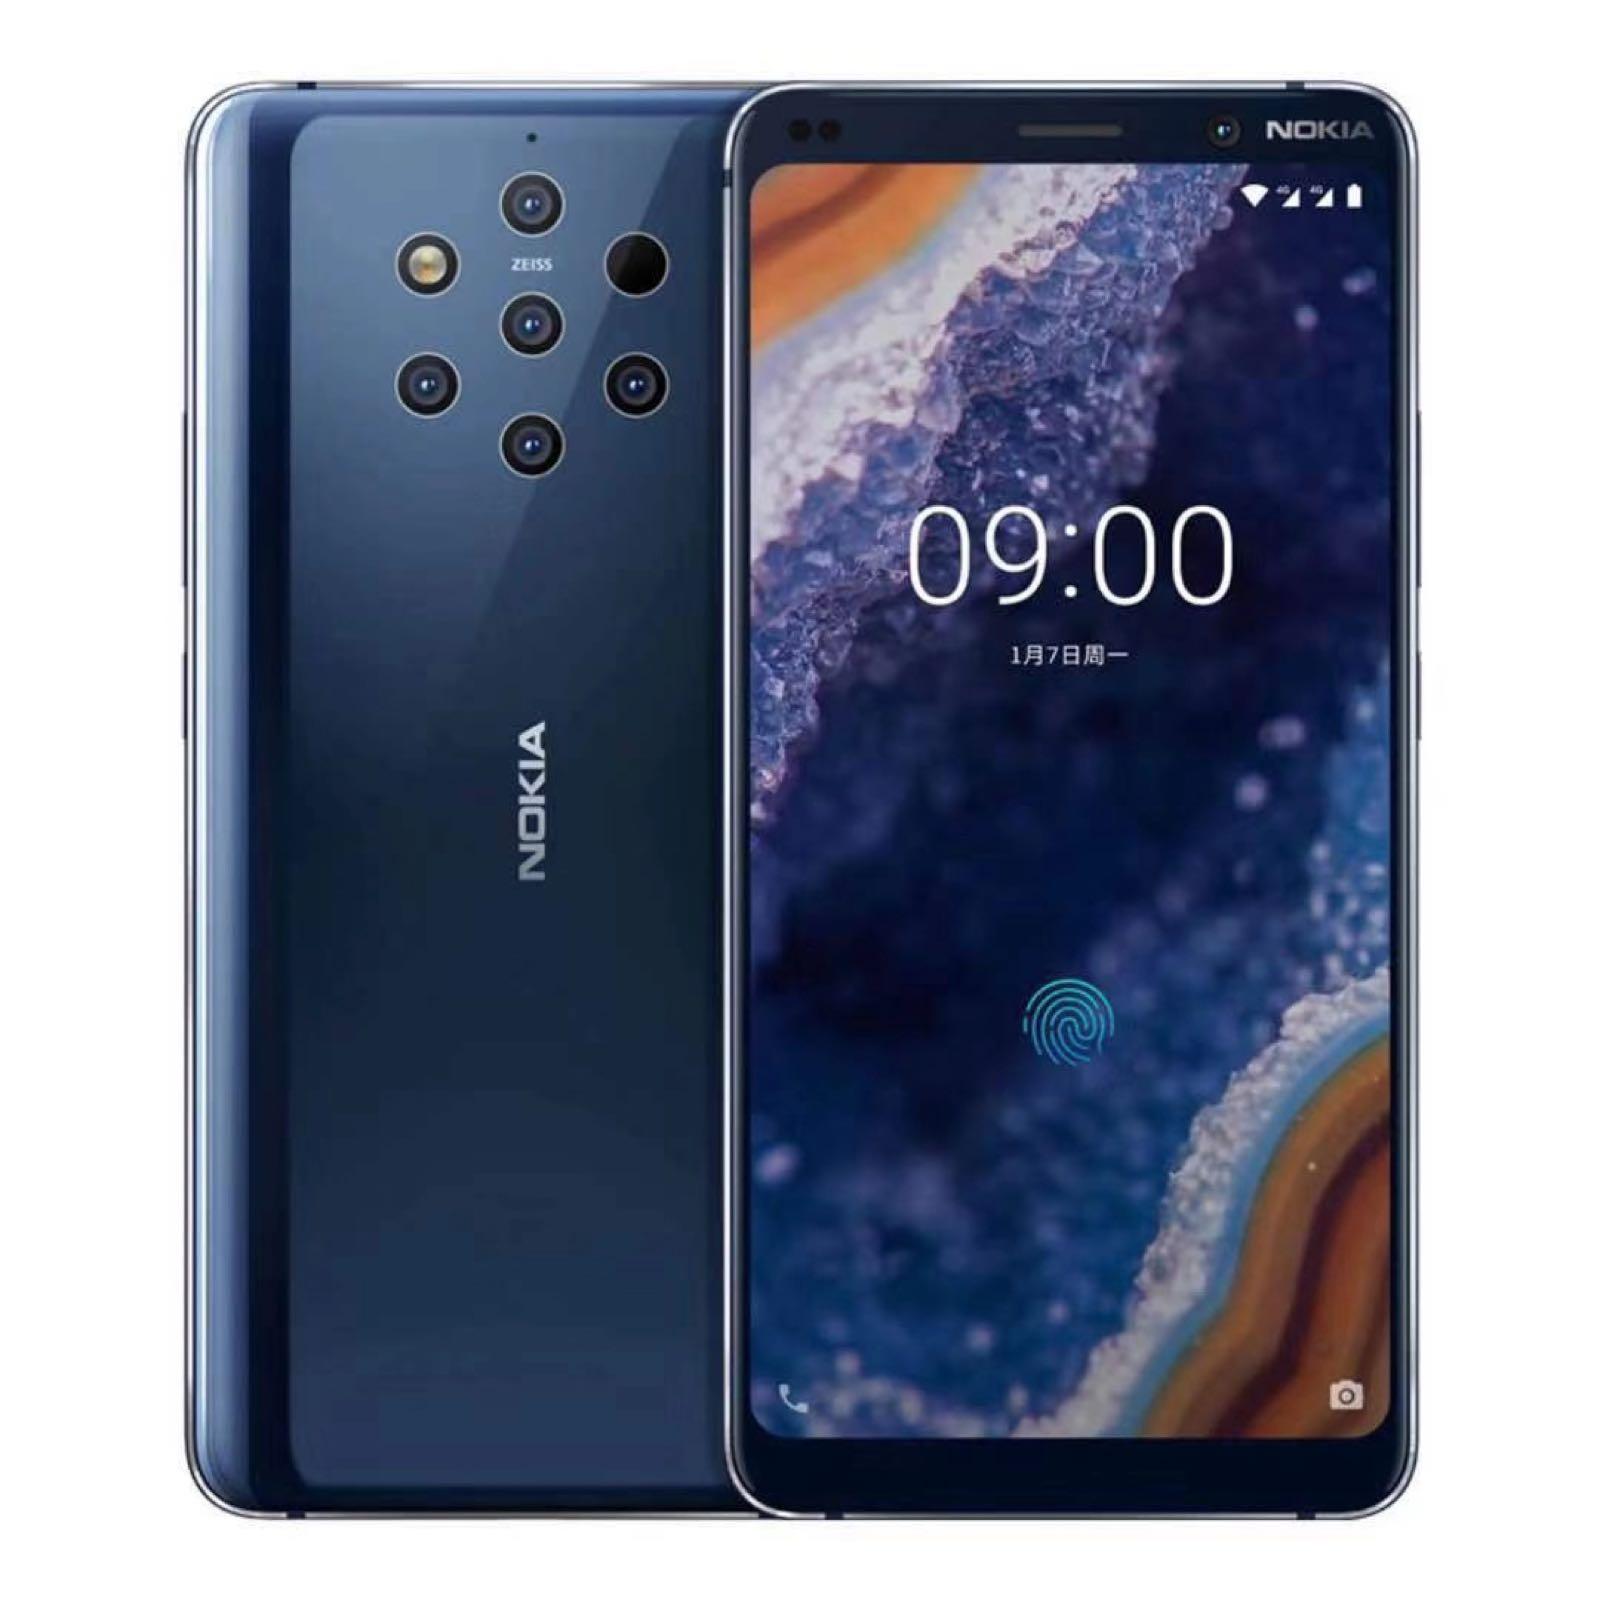 Nokia公布新智能手机,配五枚监控摄像头,外观设计神似淋浴花洒